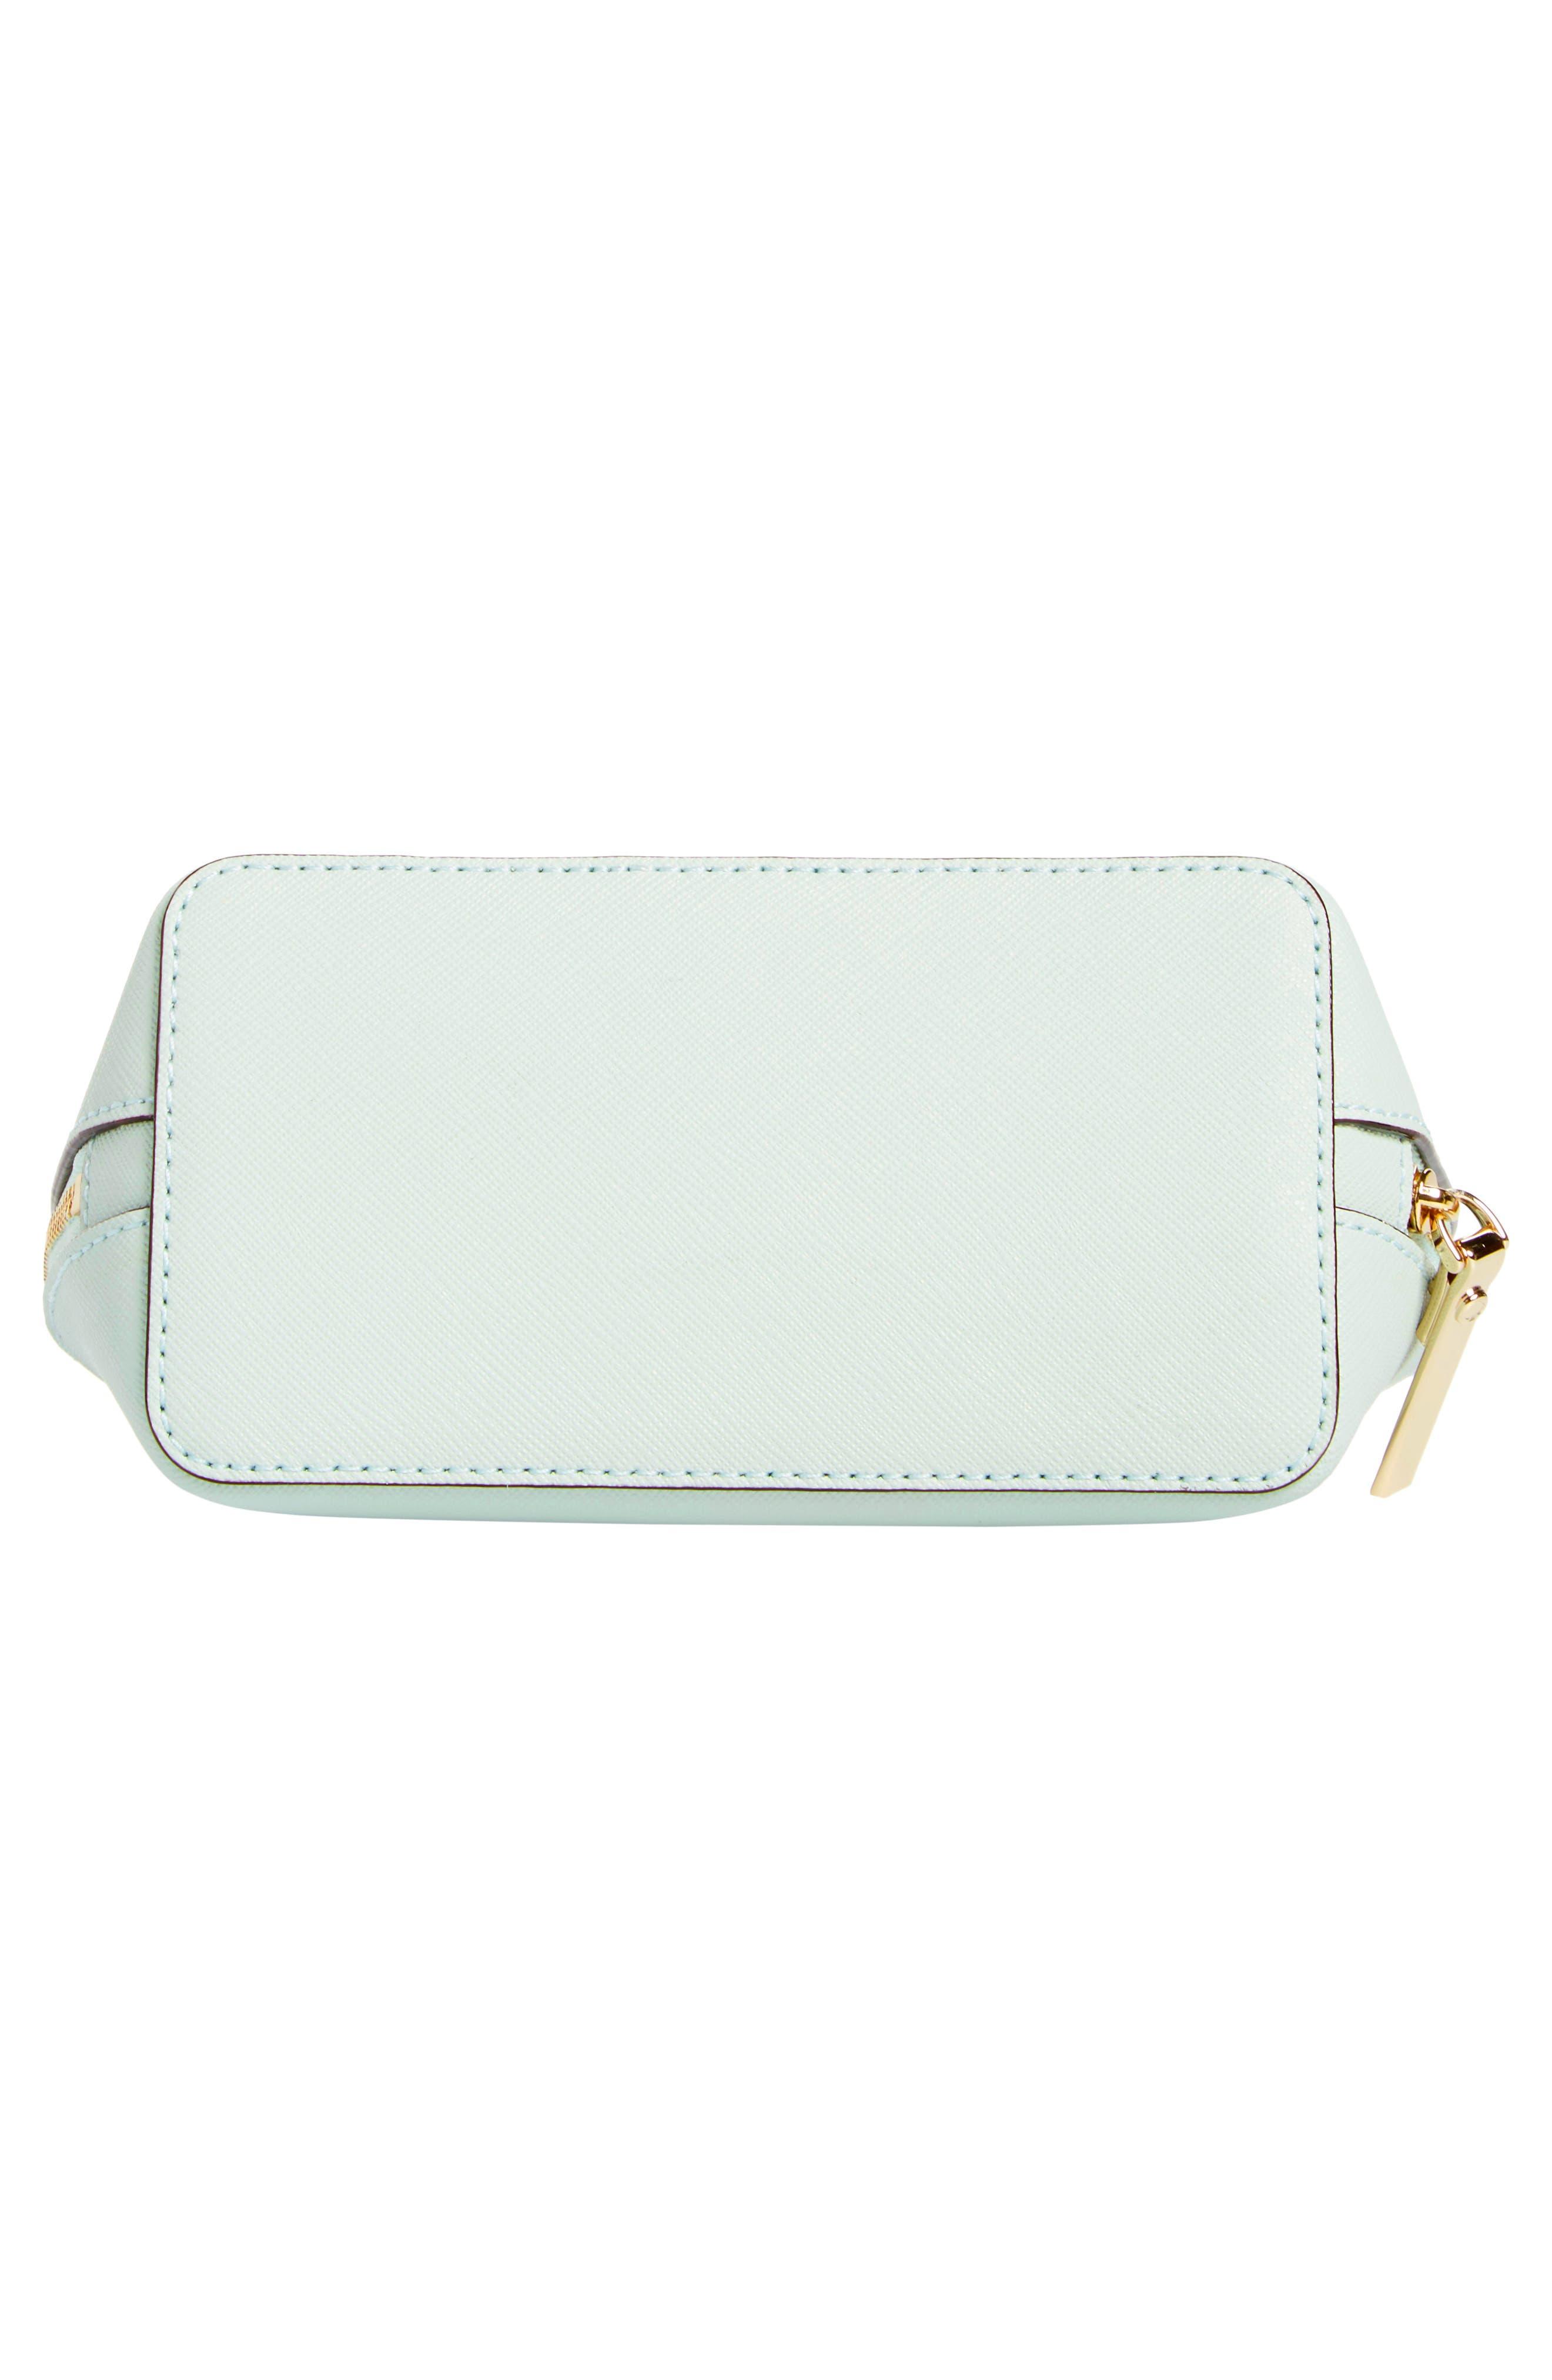 cameron street - small abalene leather cosmetics bag,                             Alternate thumbnail 5, color,                             Misty Mint